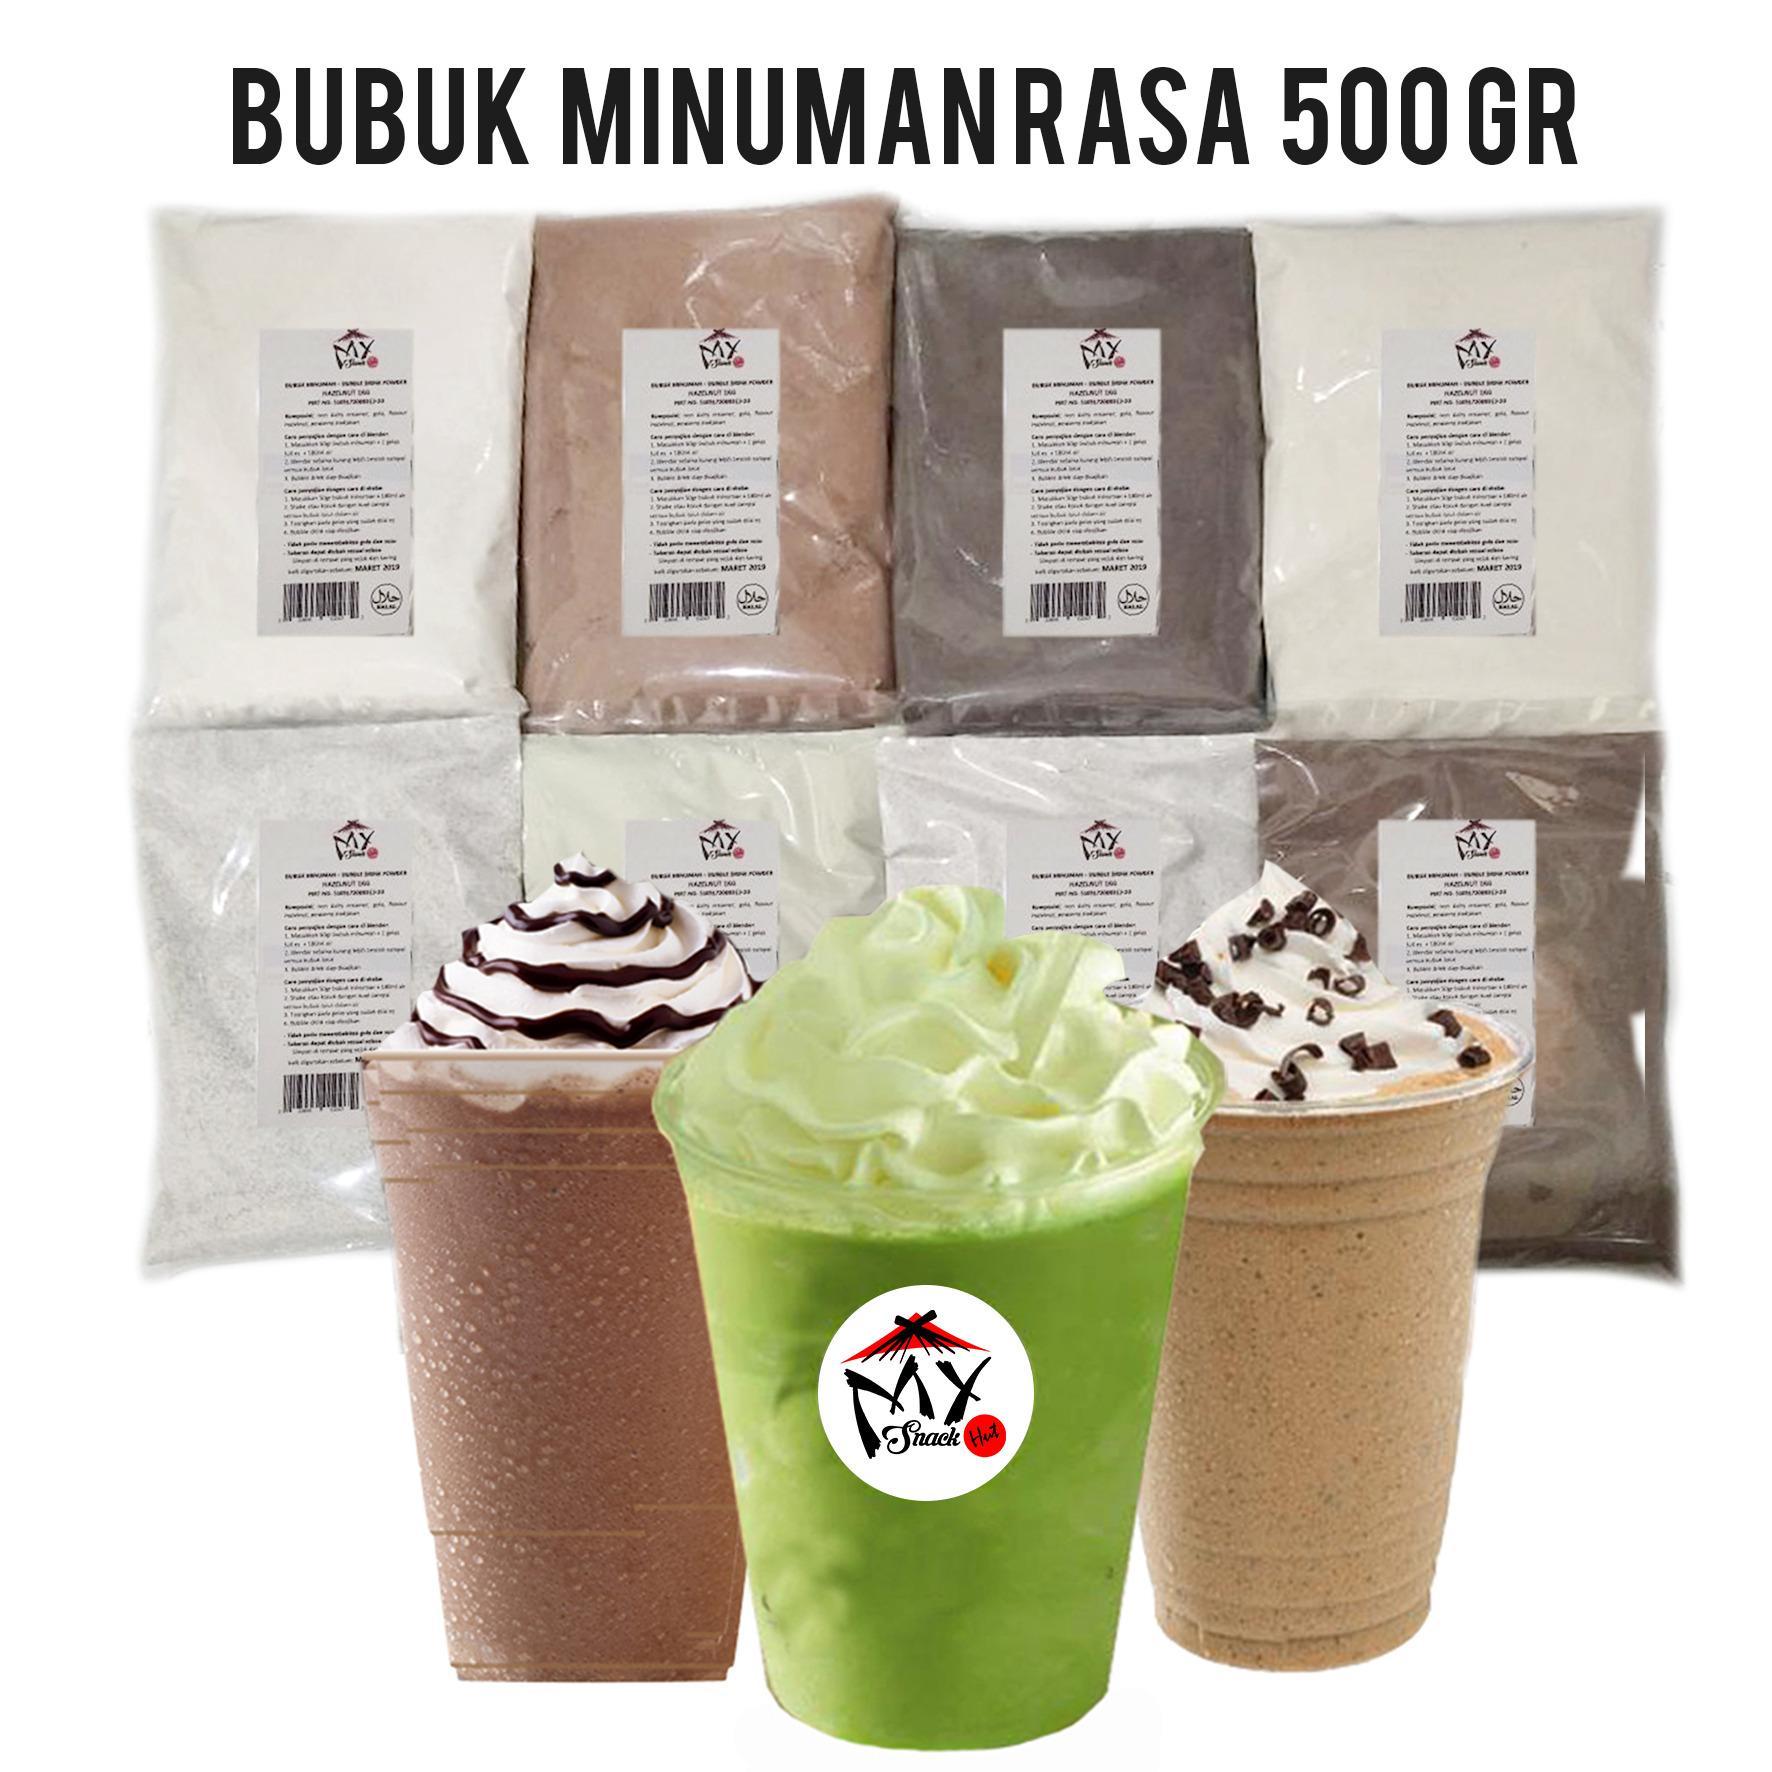 BUBUK MINUMAN RASA 500GR - BUBBLE DRINK - MILKSHAKE - ICE BLENDED POWDER - SERBUK CAPCIN - POP ICE